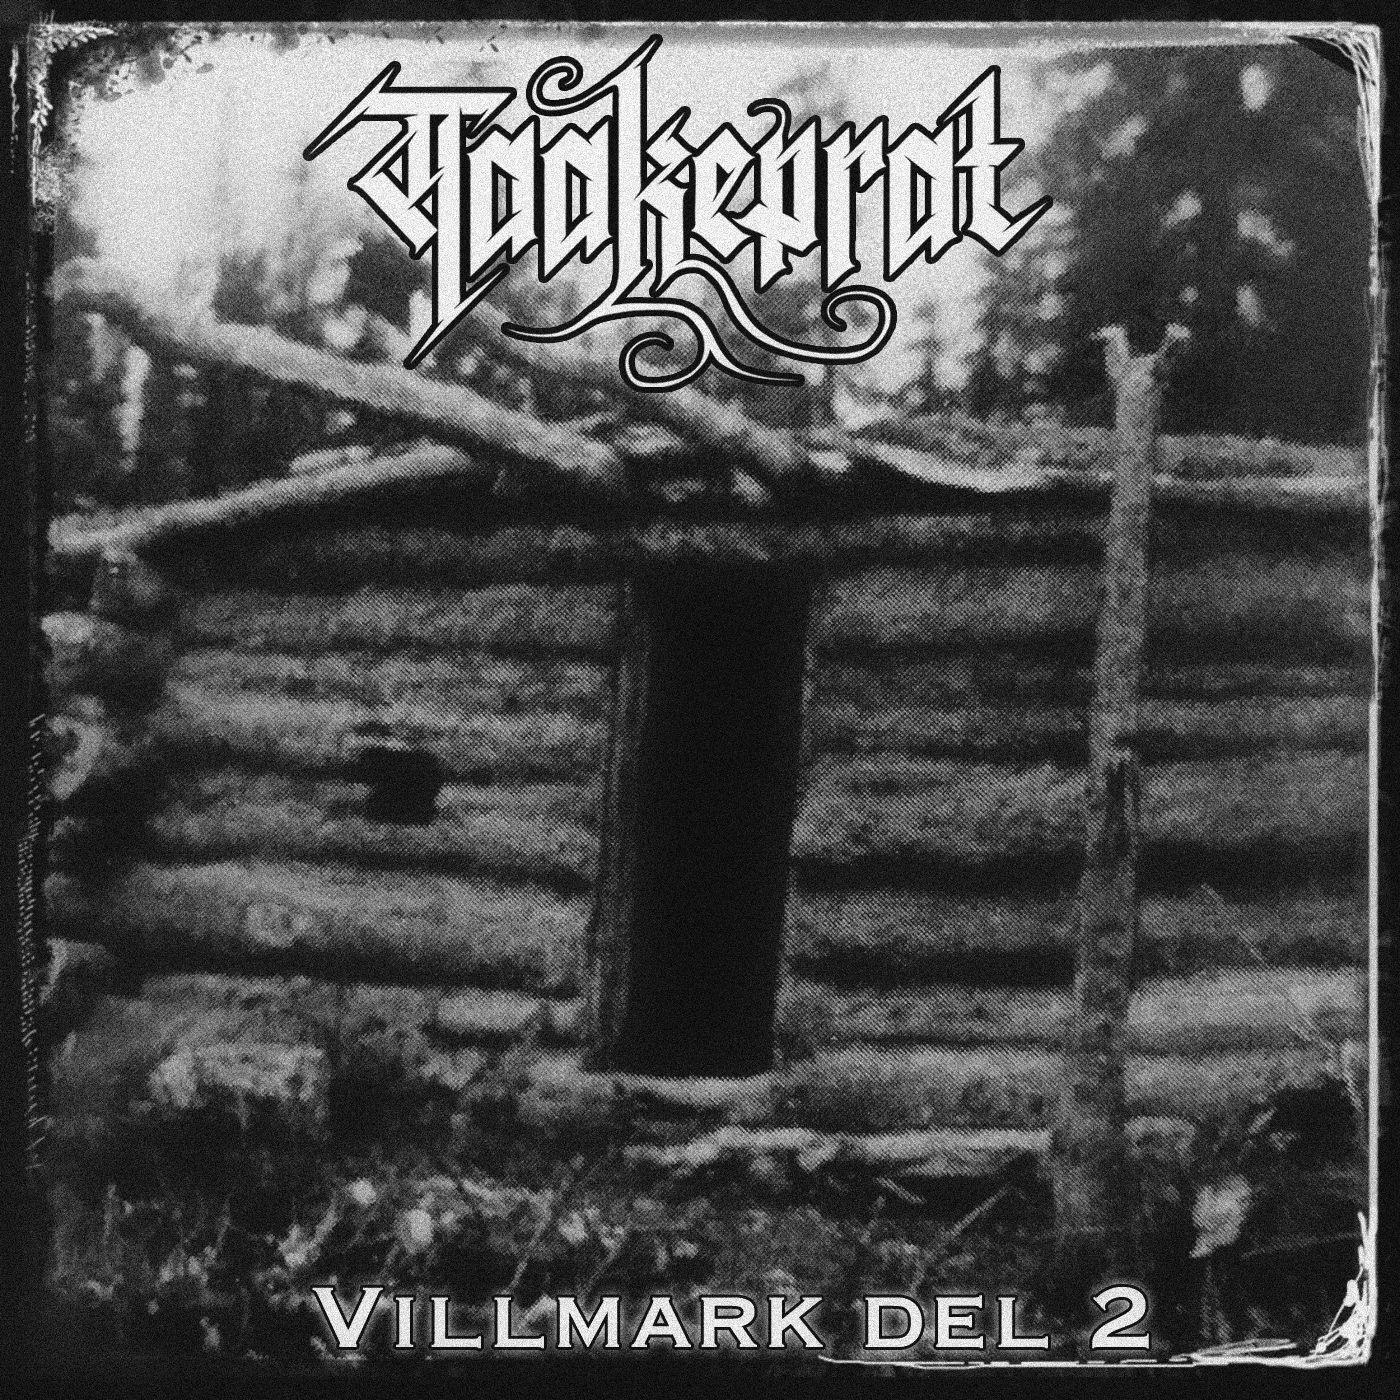 Episode 122 - Villmark del 2